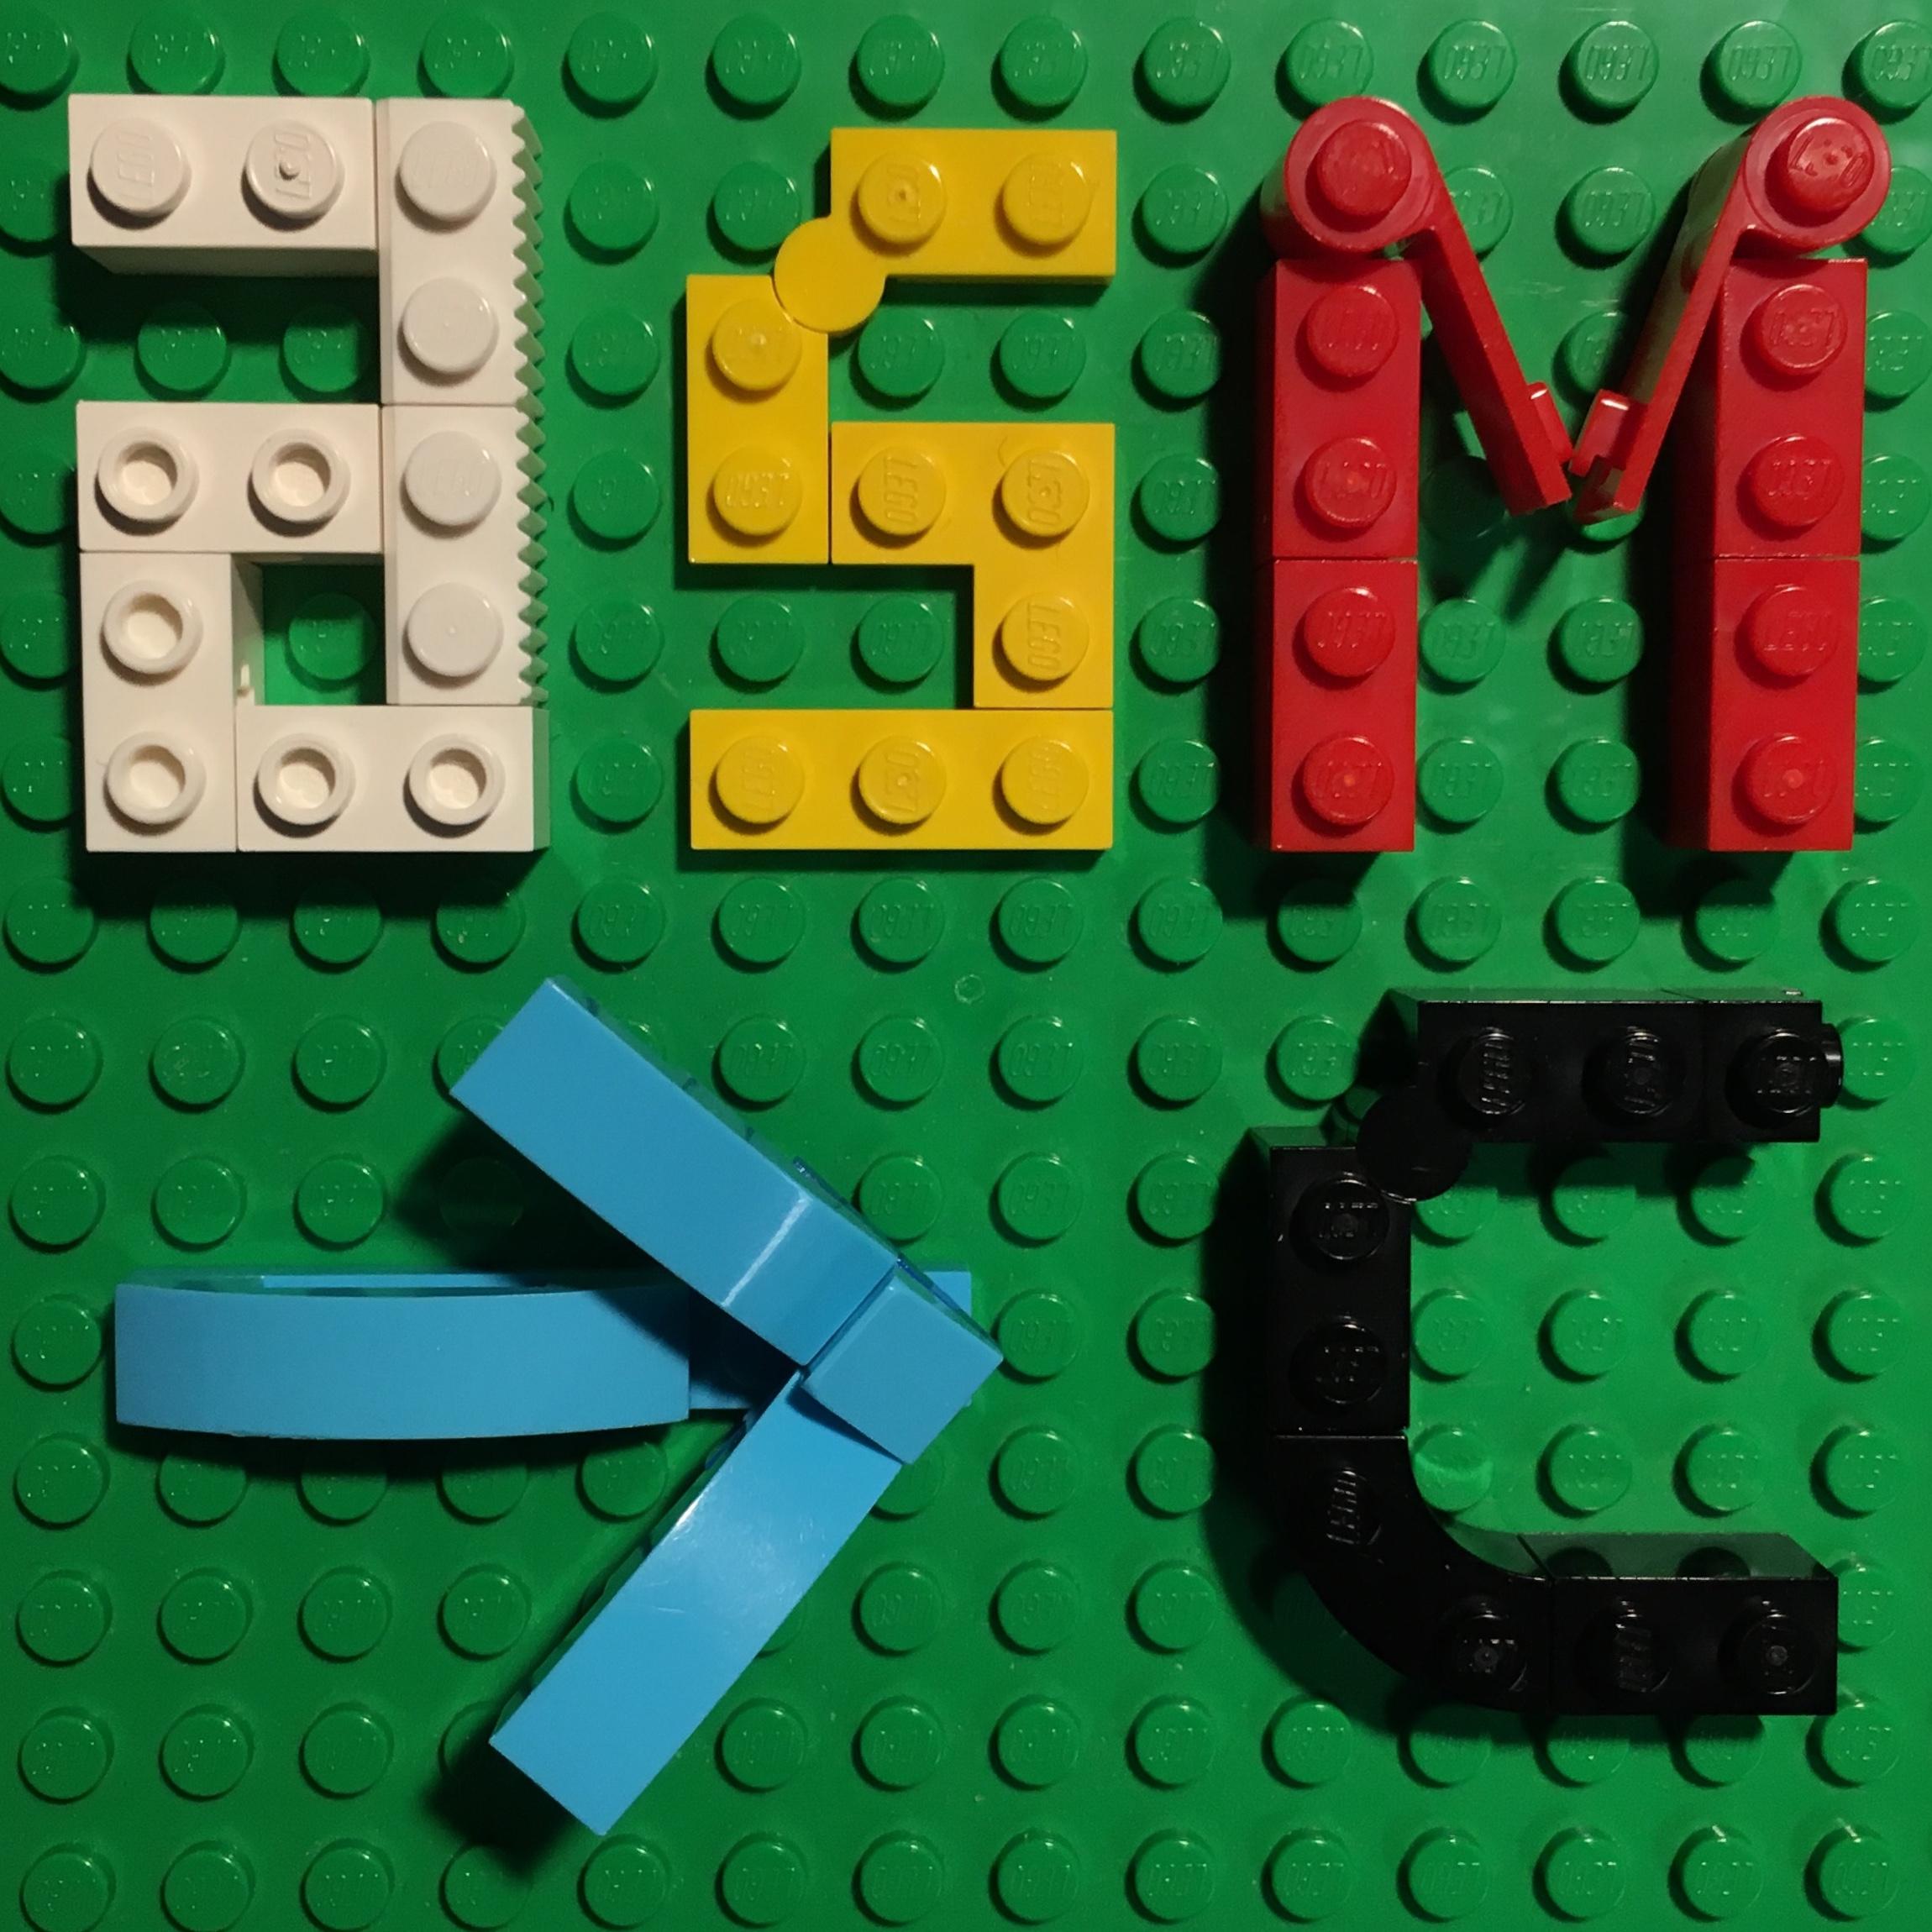 asm-to-c-lego